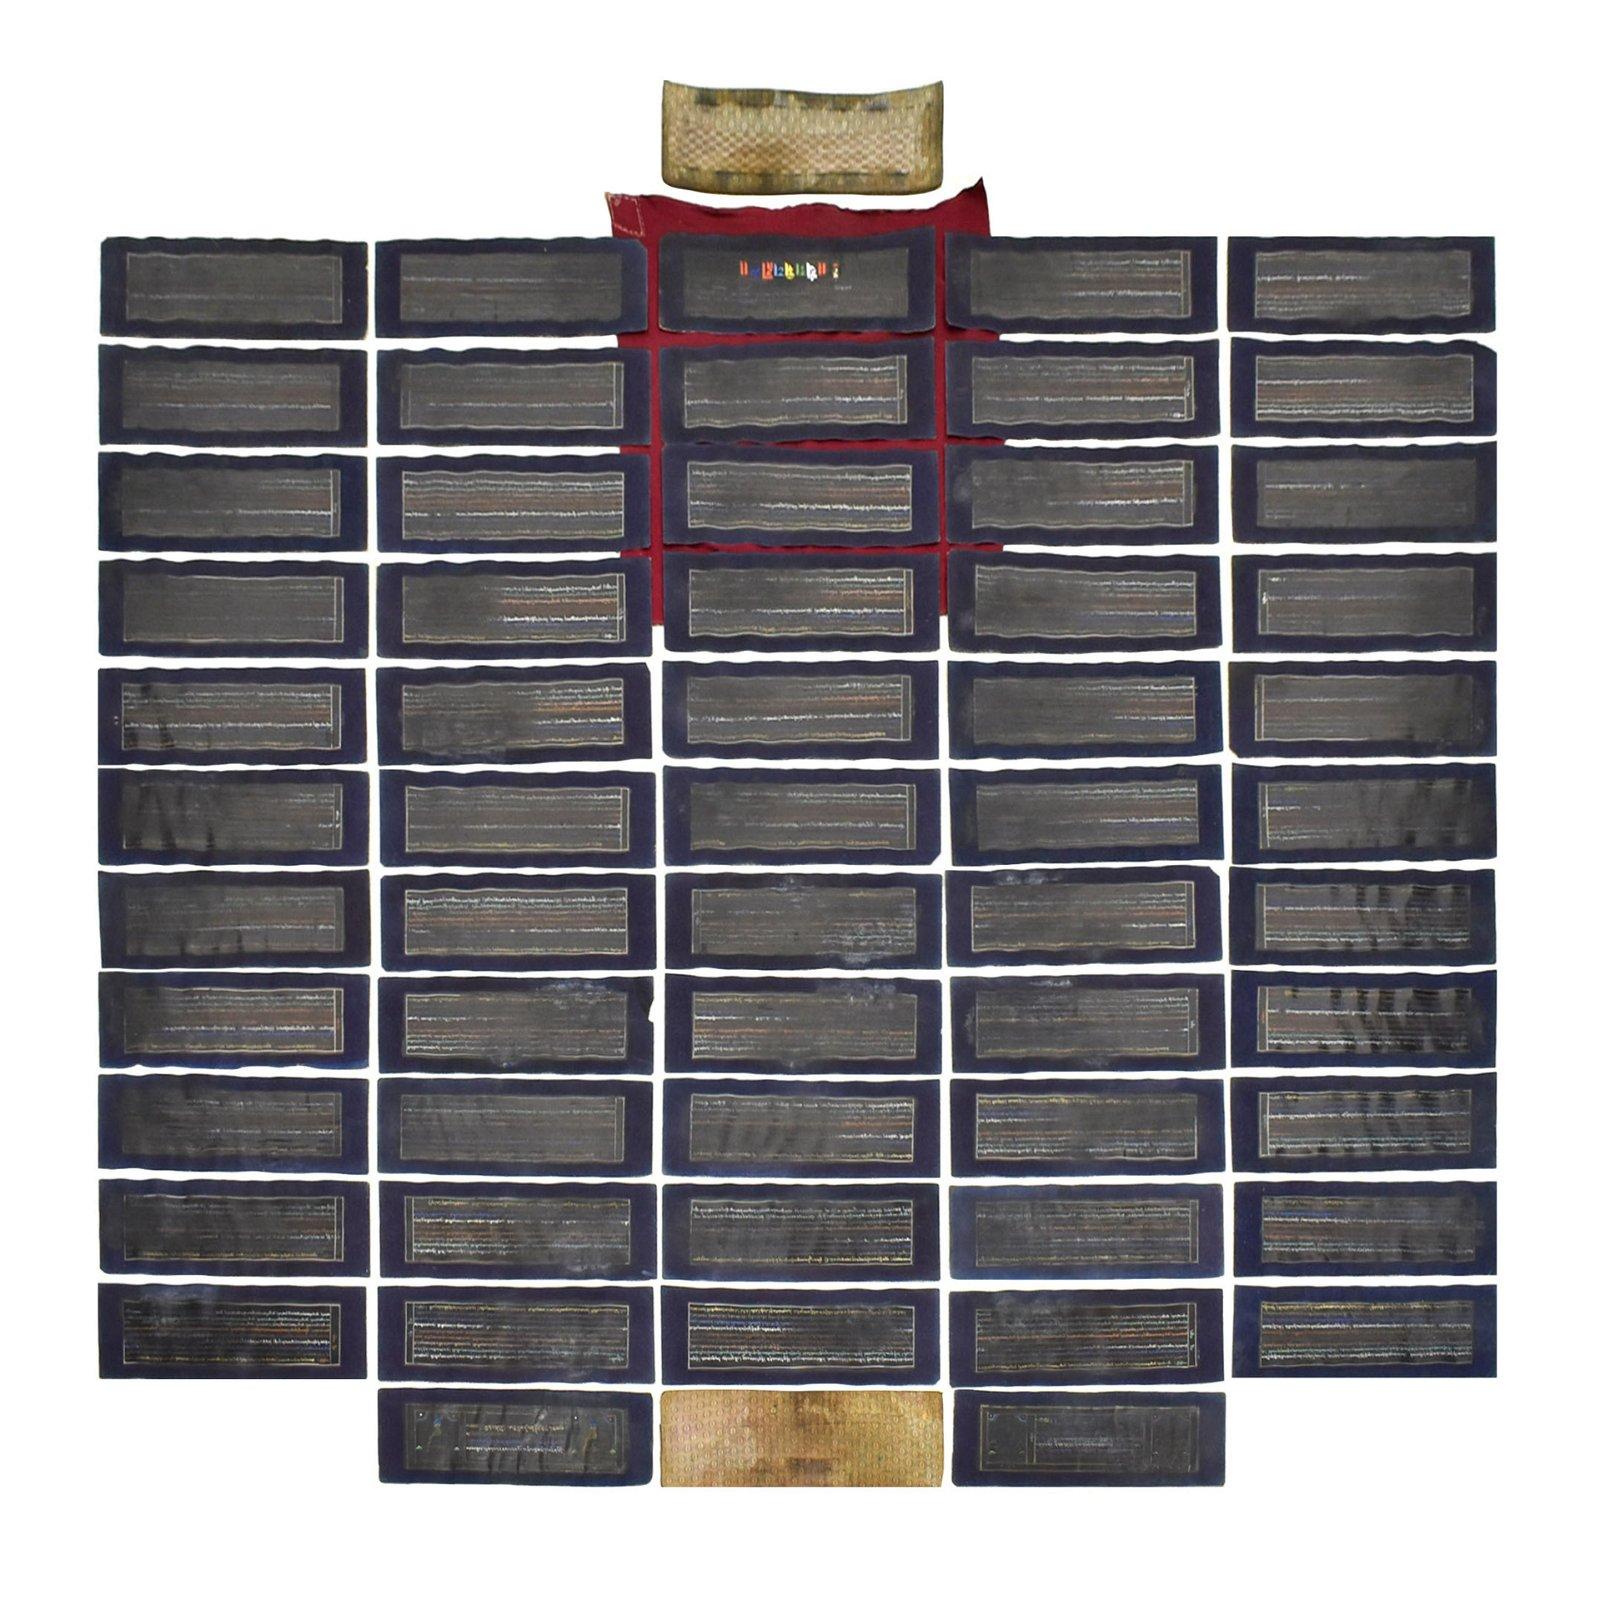 LACQUERED BUDDHIST SUTRA ALBUM